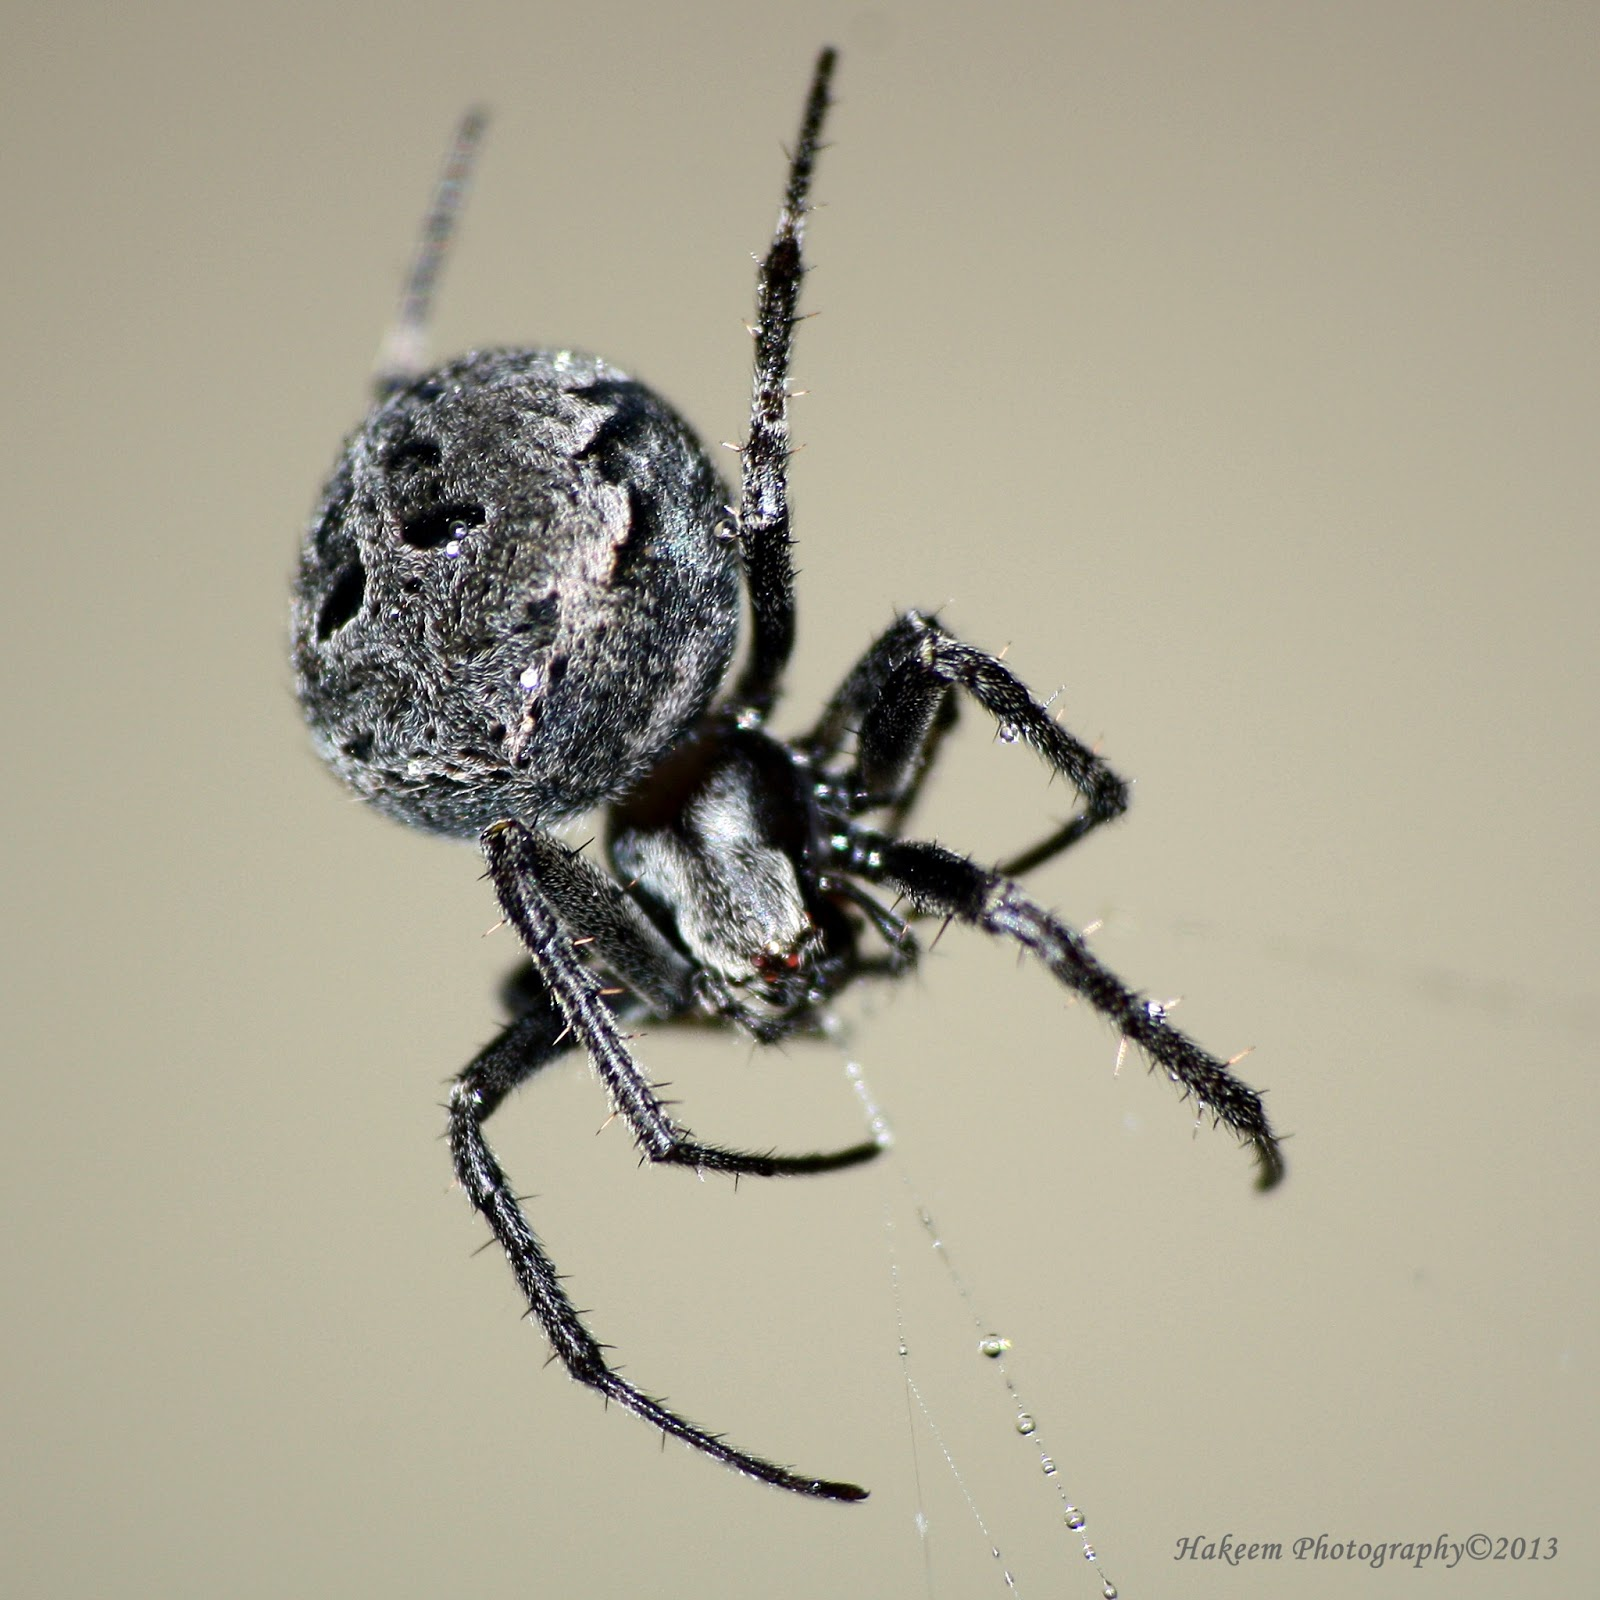 House Spider 3